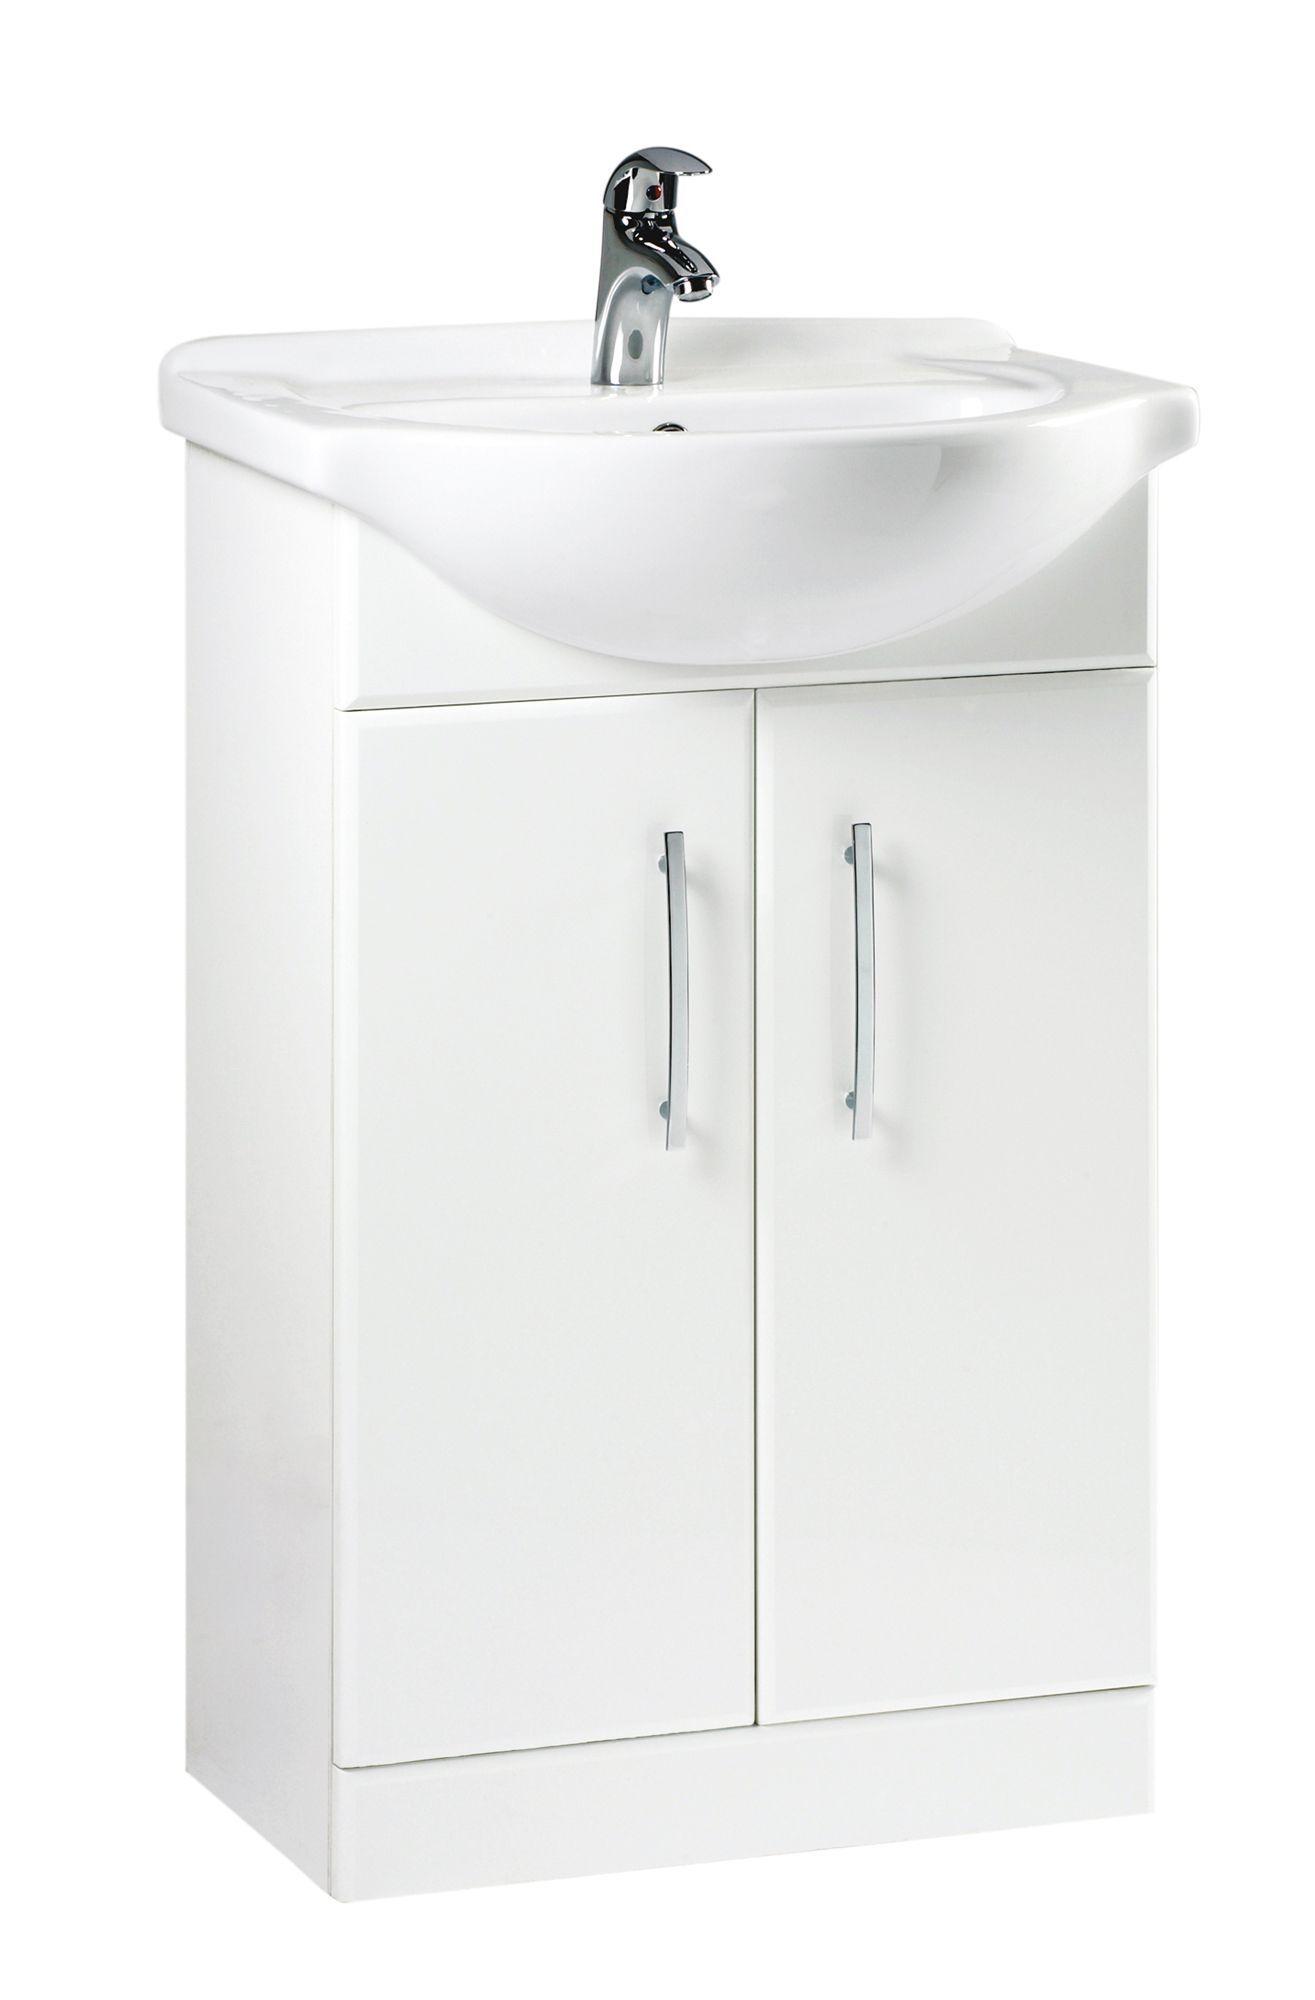 B&Q £87 | Bathroom vanity tops, Bathroom vanity units ...